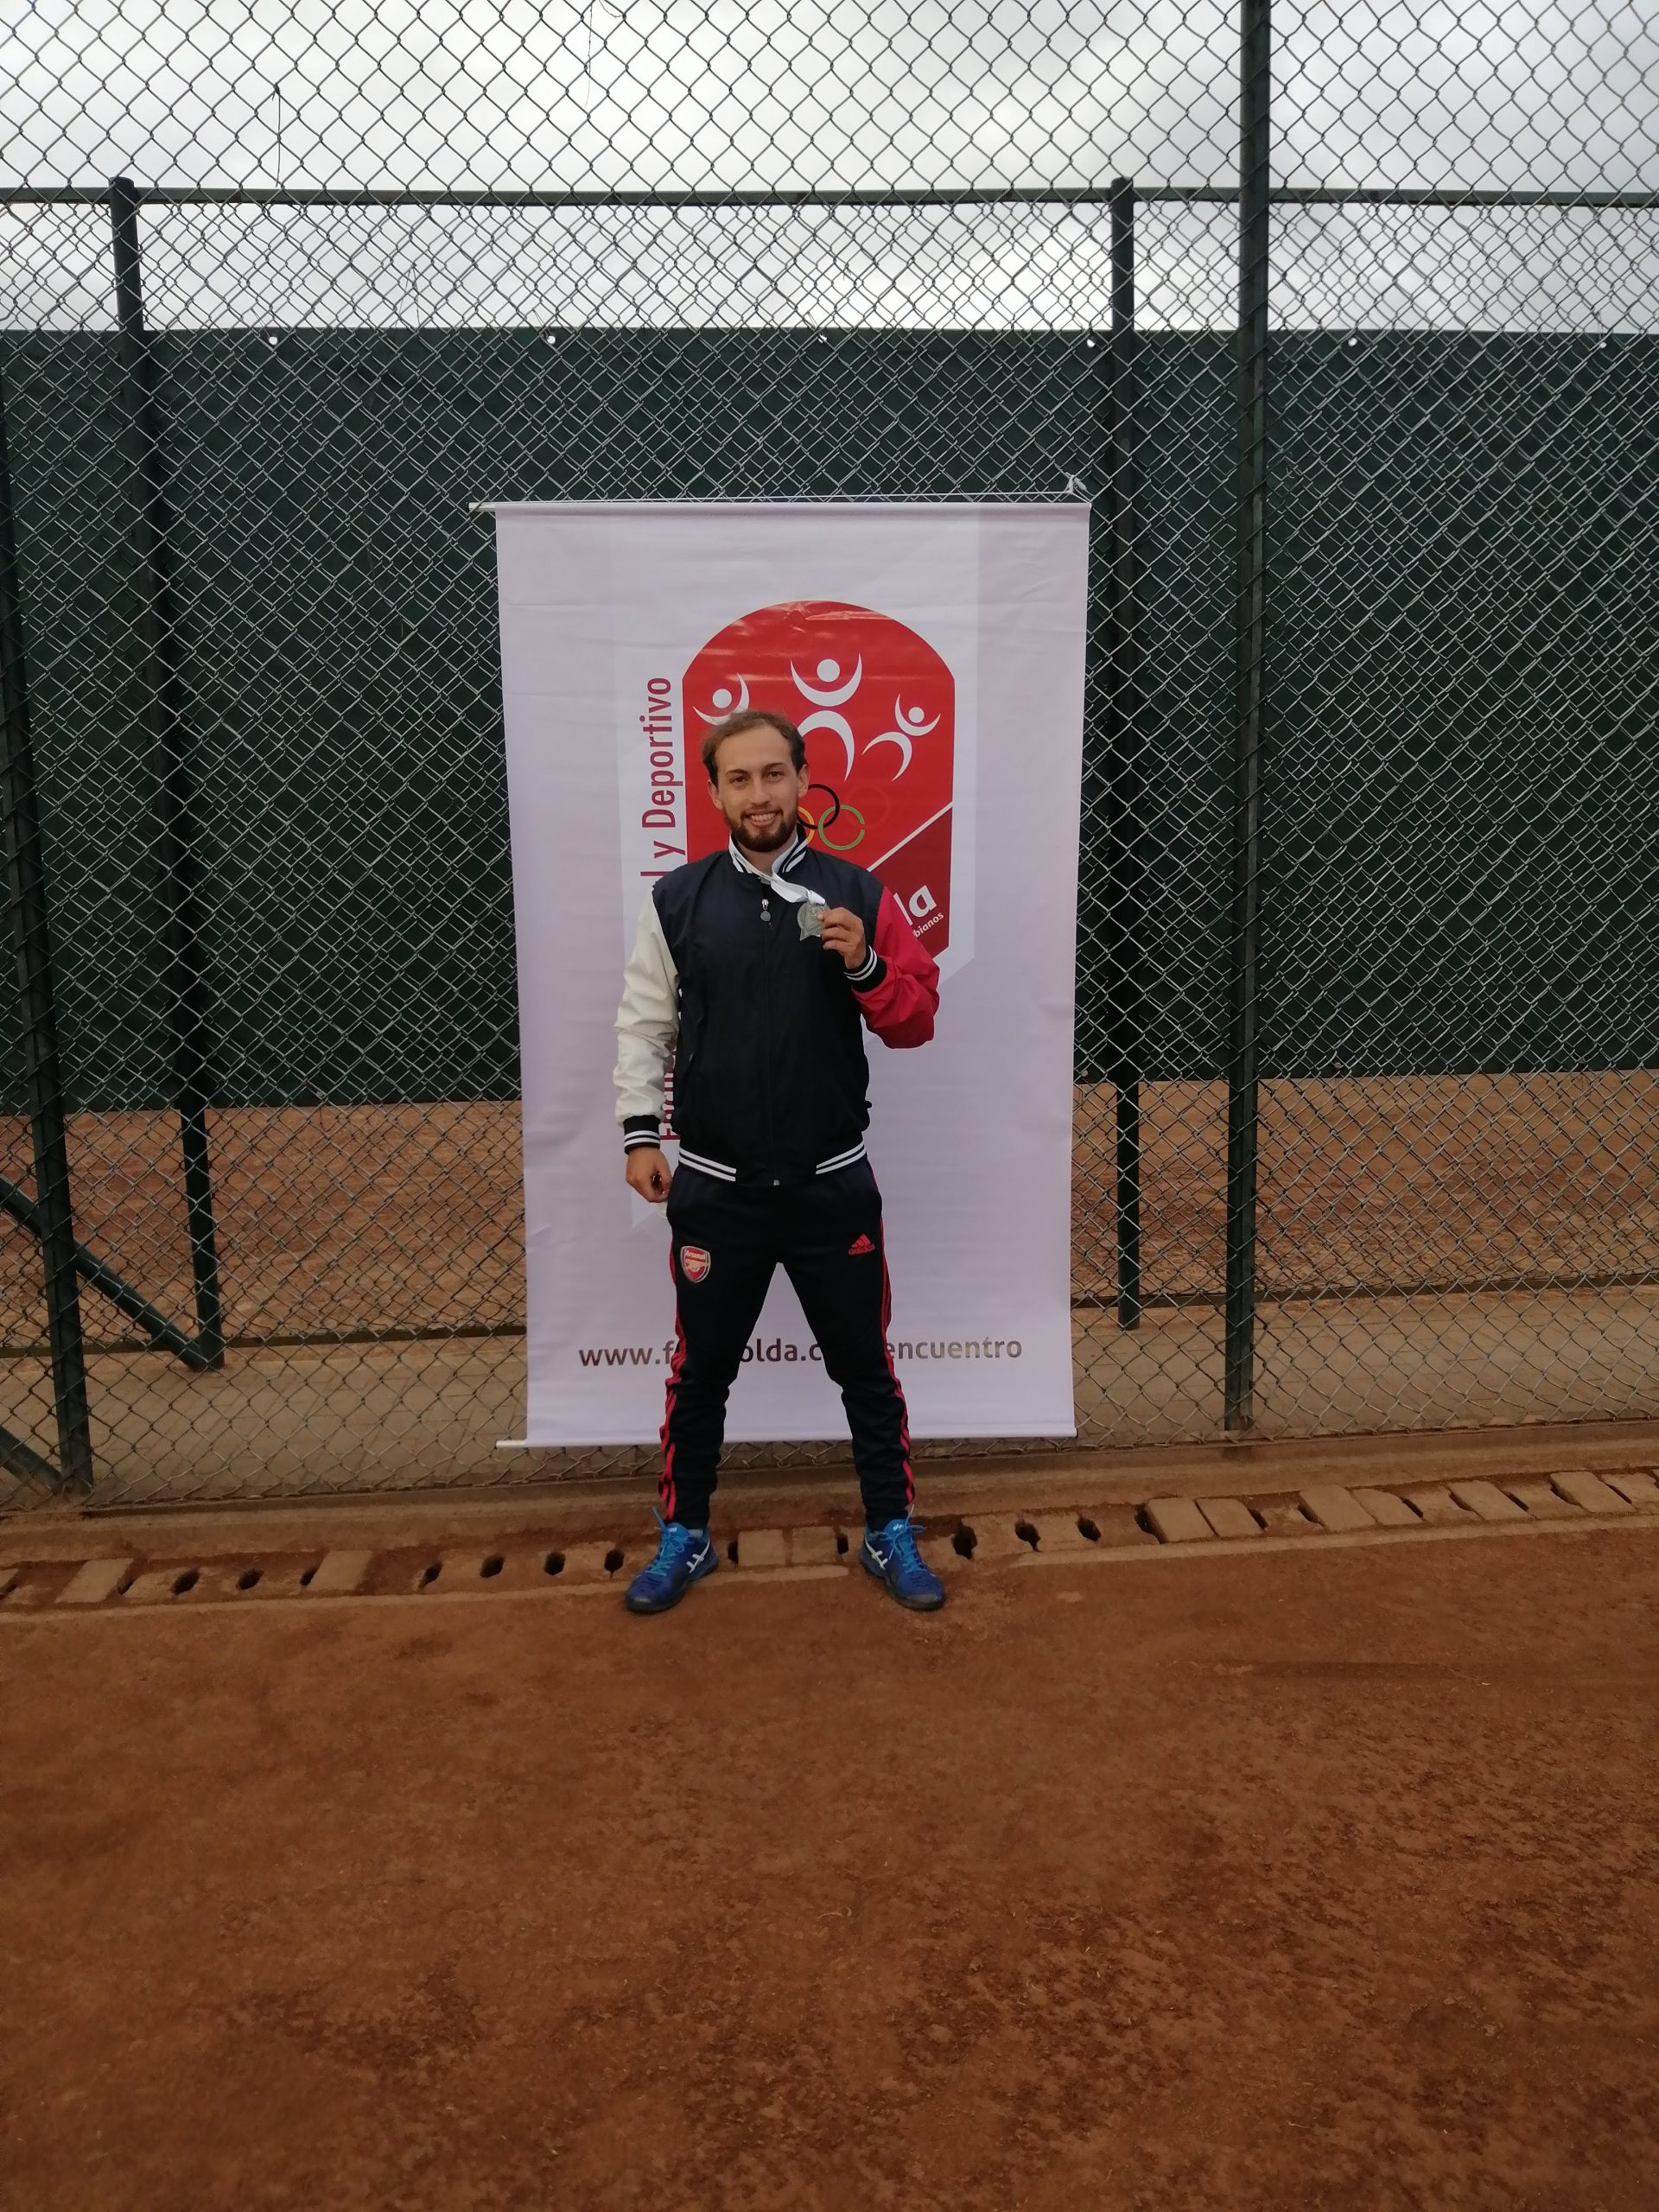 Johan Perdomo - Seguros Mundial - 2° Lugar